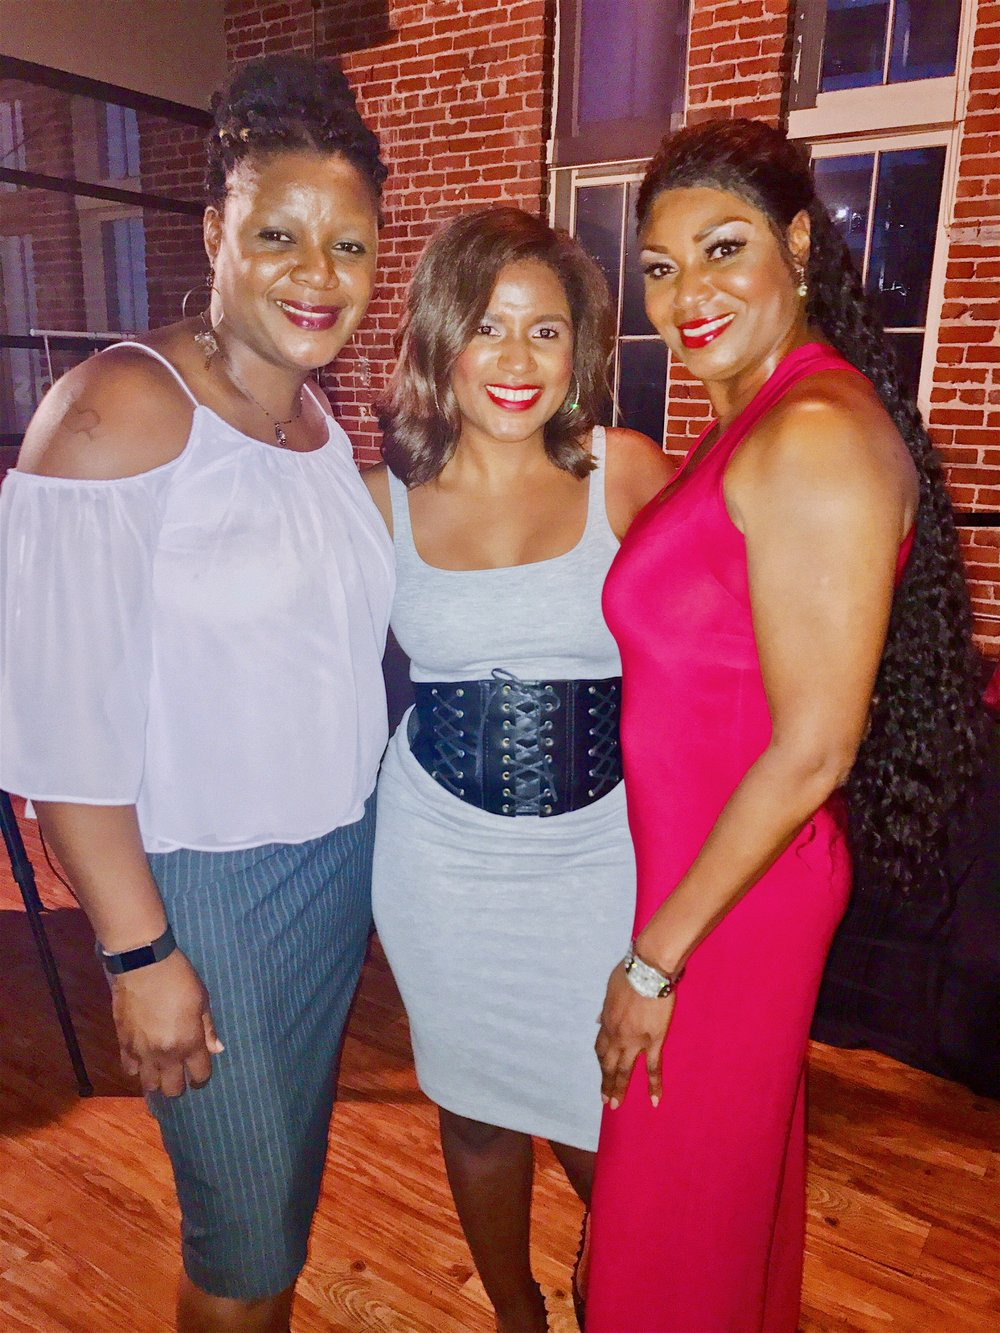 FLIGHT CREW: Irene Bell, Allison Jones (Co-Founder), Cyndi Mathis